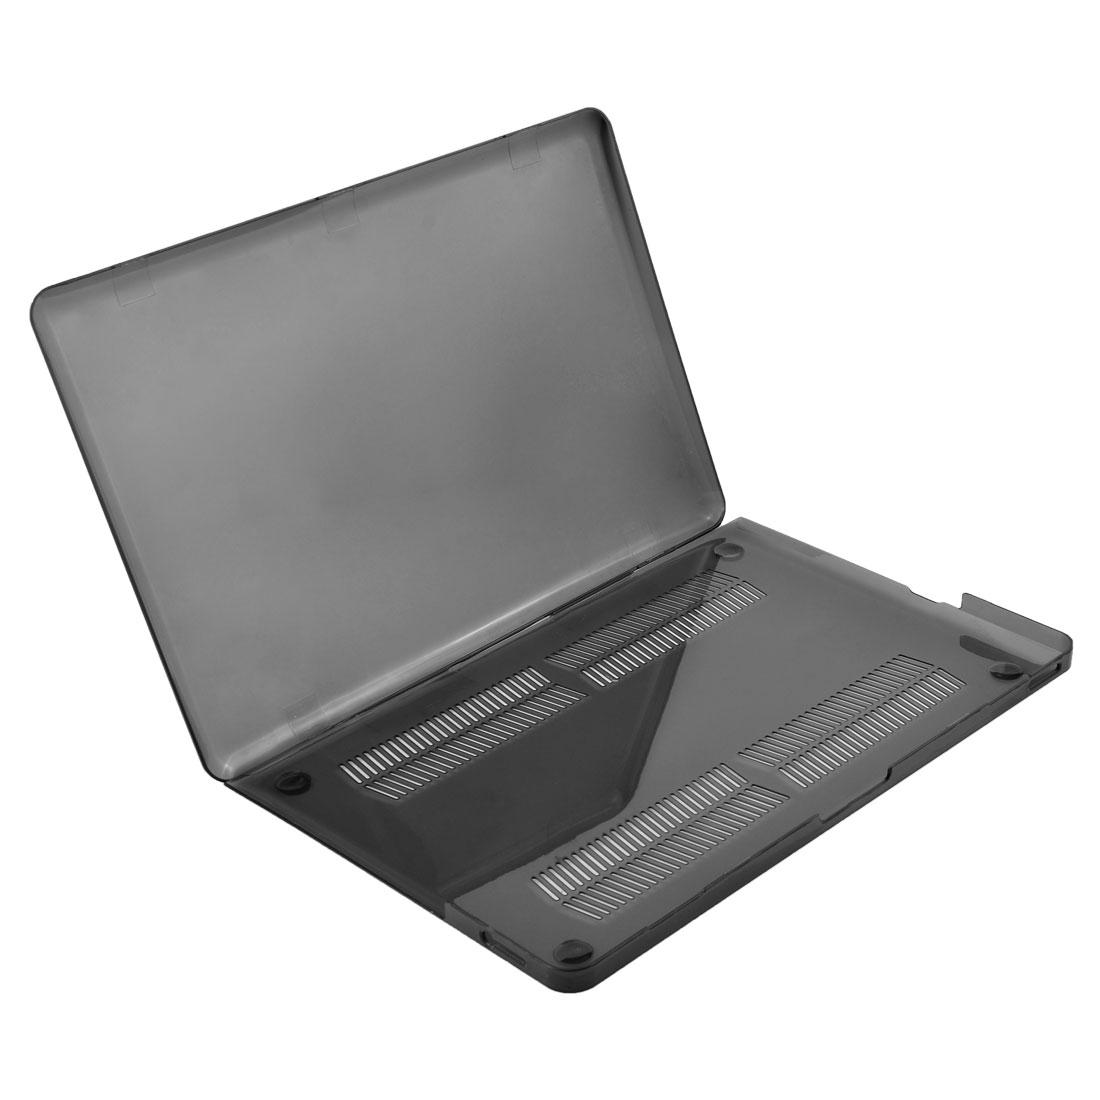 Plastic Non-Slip Protector Cover Hard Case Shell Black for Macbook Pro 15 Inch